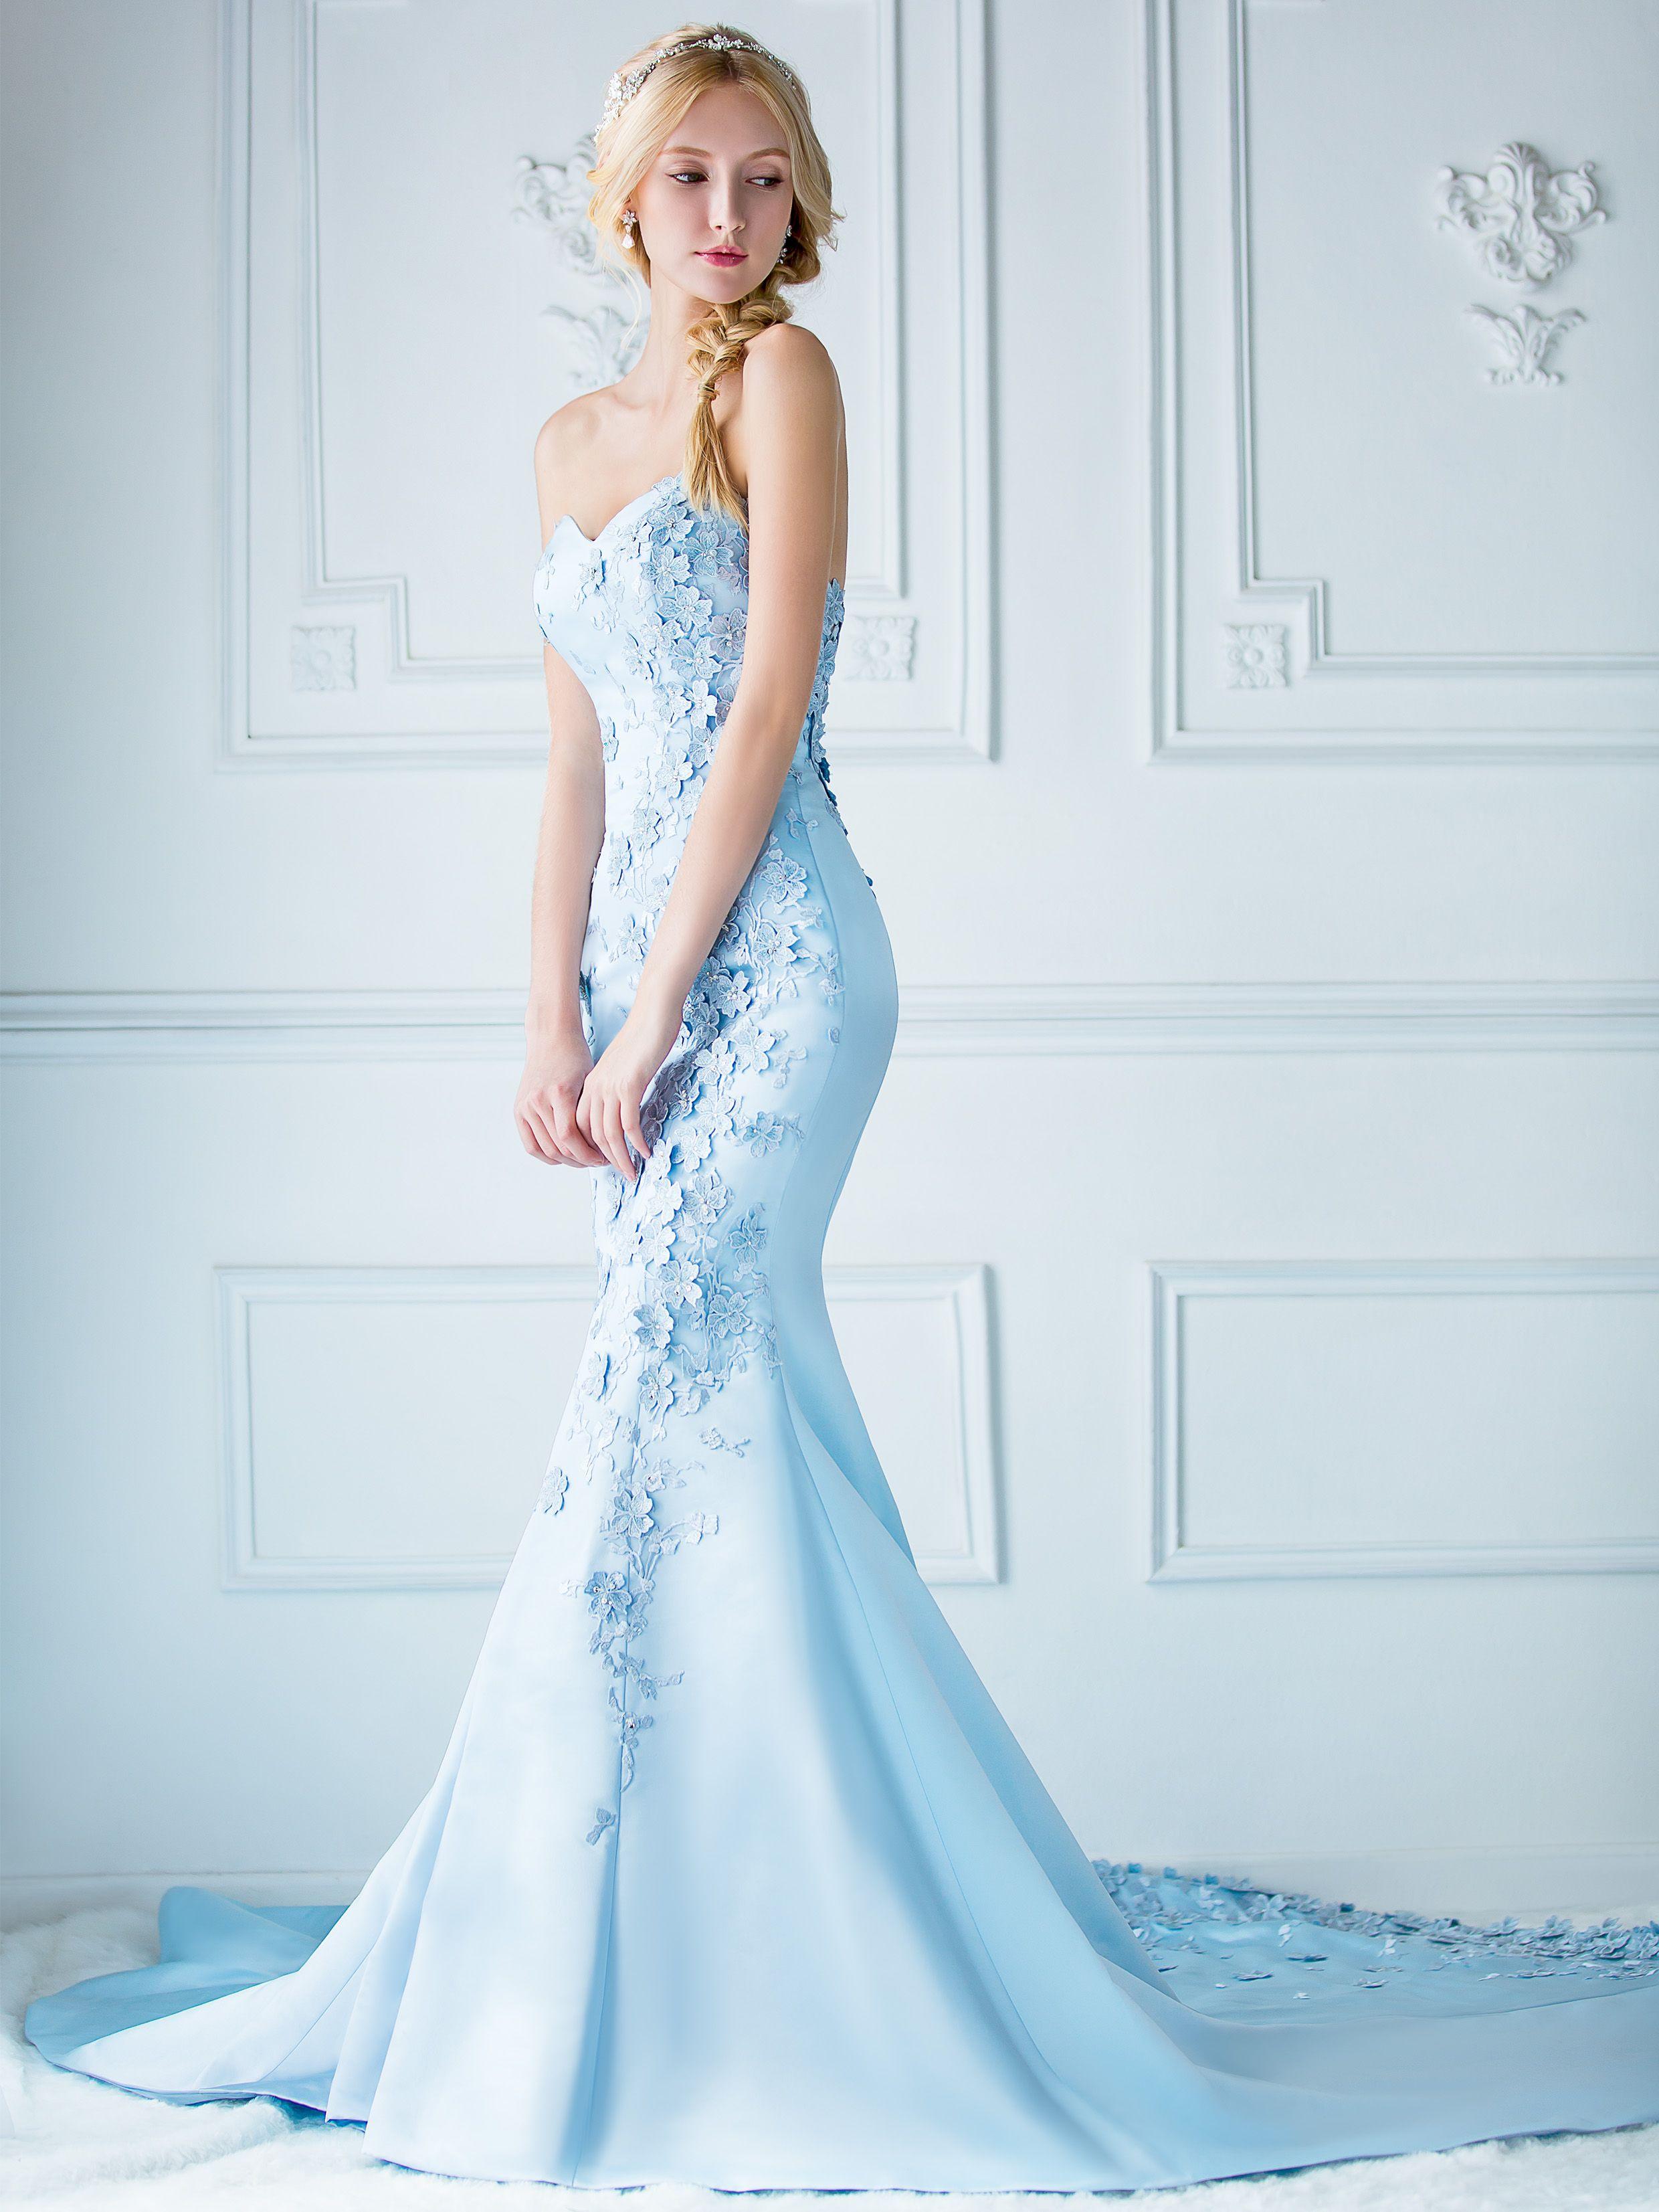 Digio Bridal Colorful Dreams Collection Cinderella Blue Wedding Dresses Baby Blue Wedding Dresses Mermaid Evening Dresses [ 3306 x 2480 Pixel ]